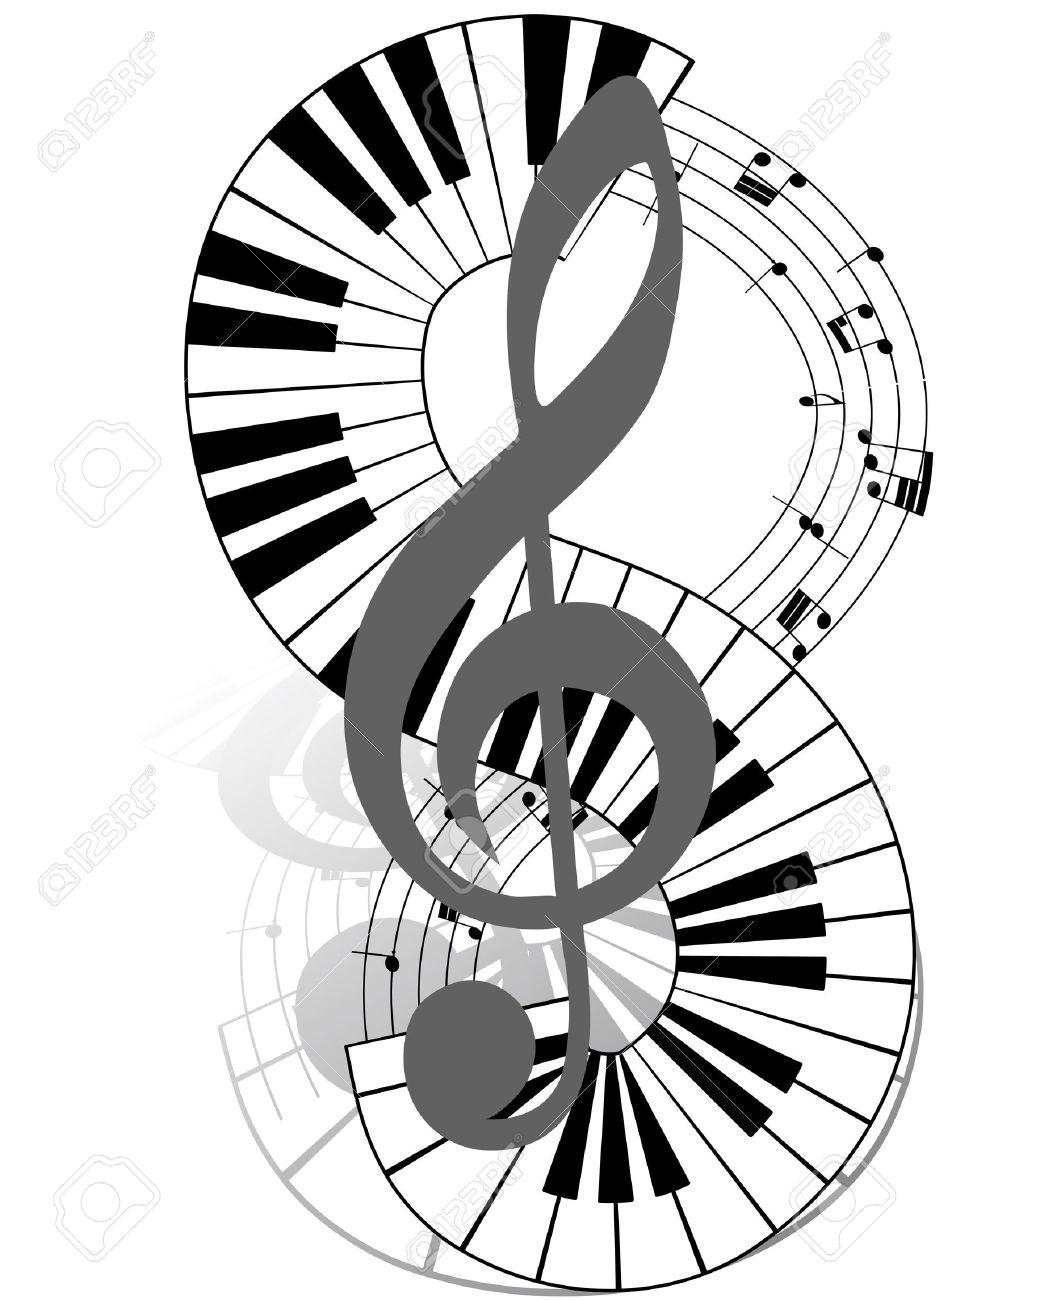 Note Musique Sur Clavier Piano Clavier Piano Les Notes de